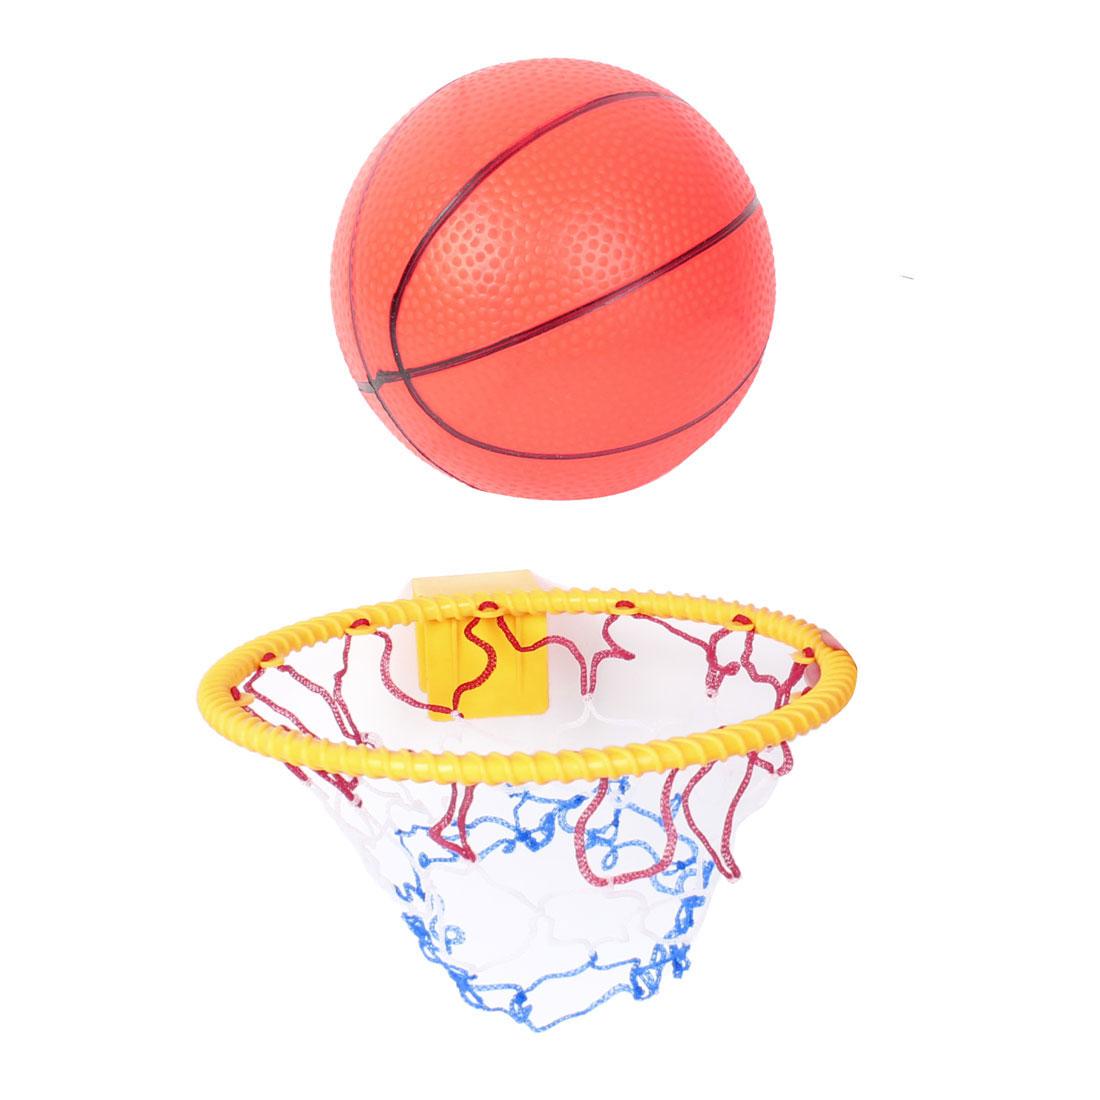 Kids Sports Toy Gift Set Yellow Plastic Basketball Hoop w Inflatable Mini Ball